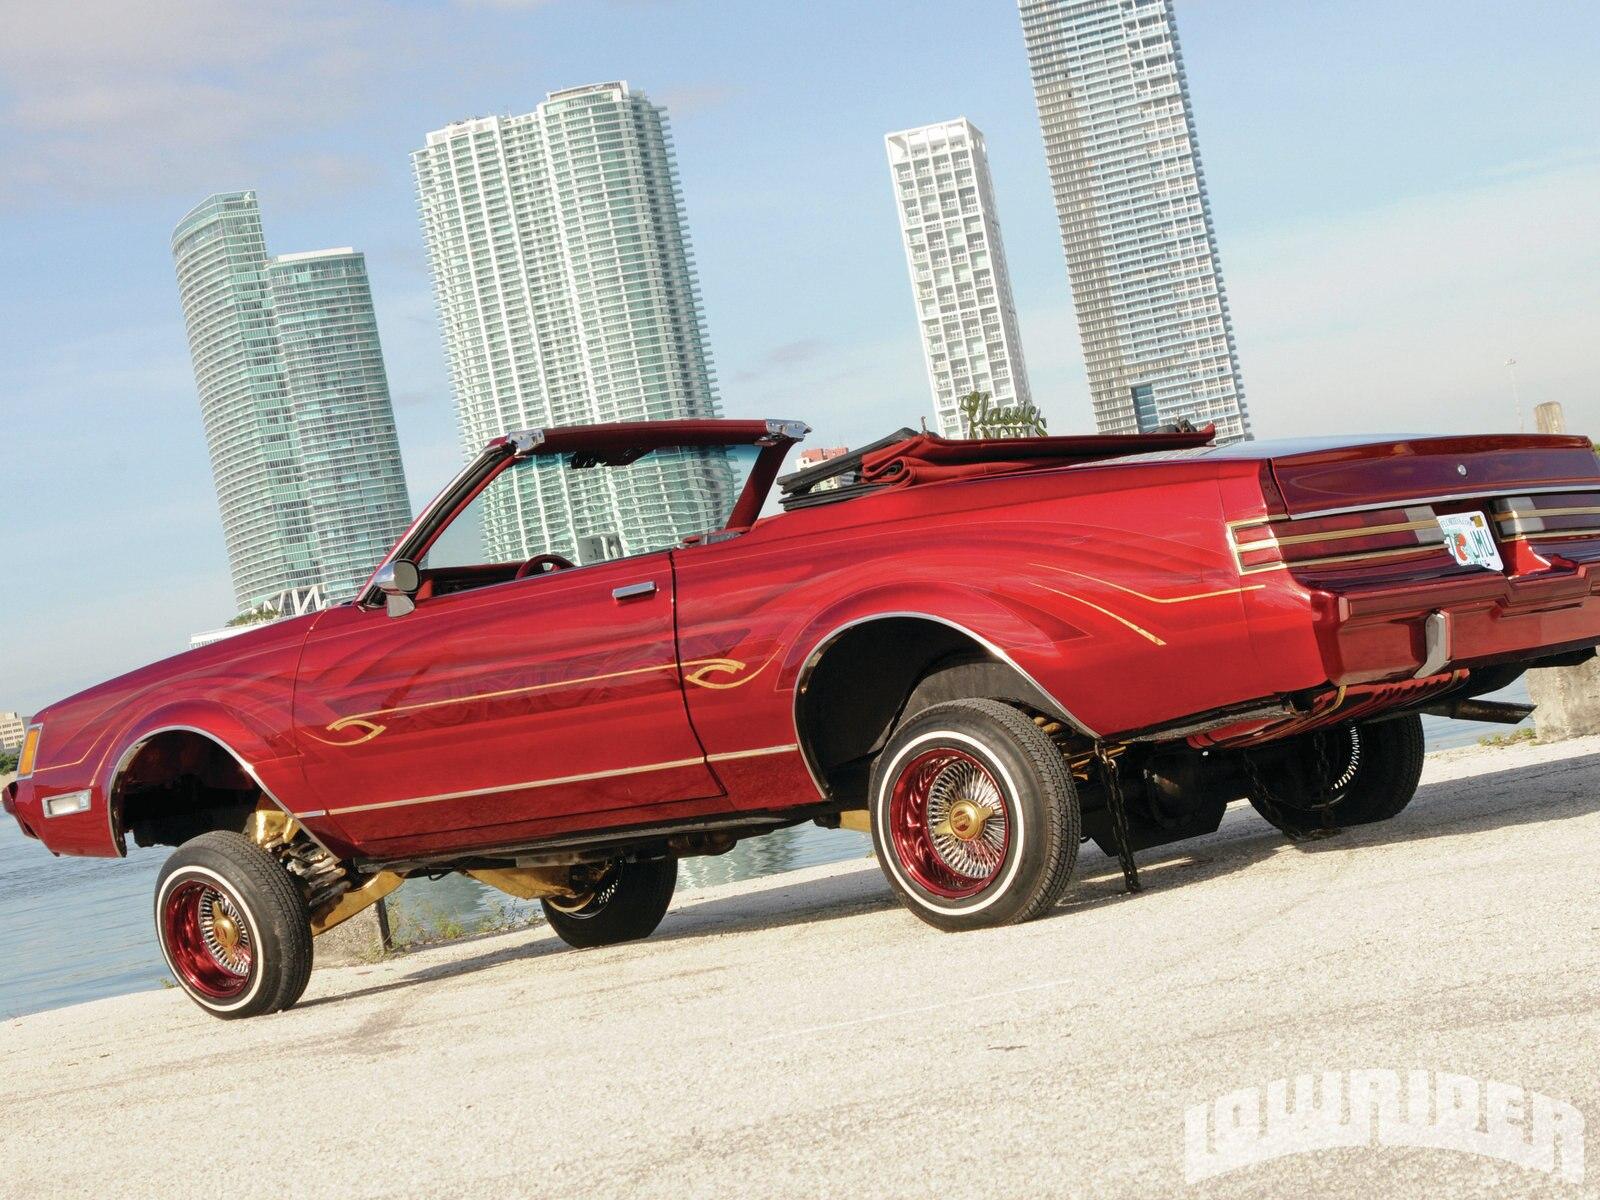 Lowrider Miami >> 1985 Buick Regal - Lowrider Magazine